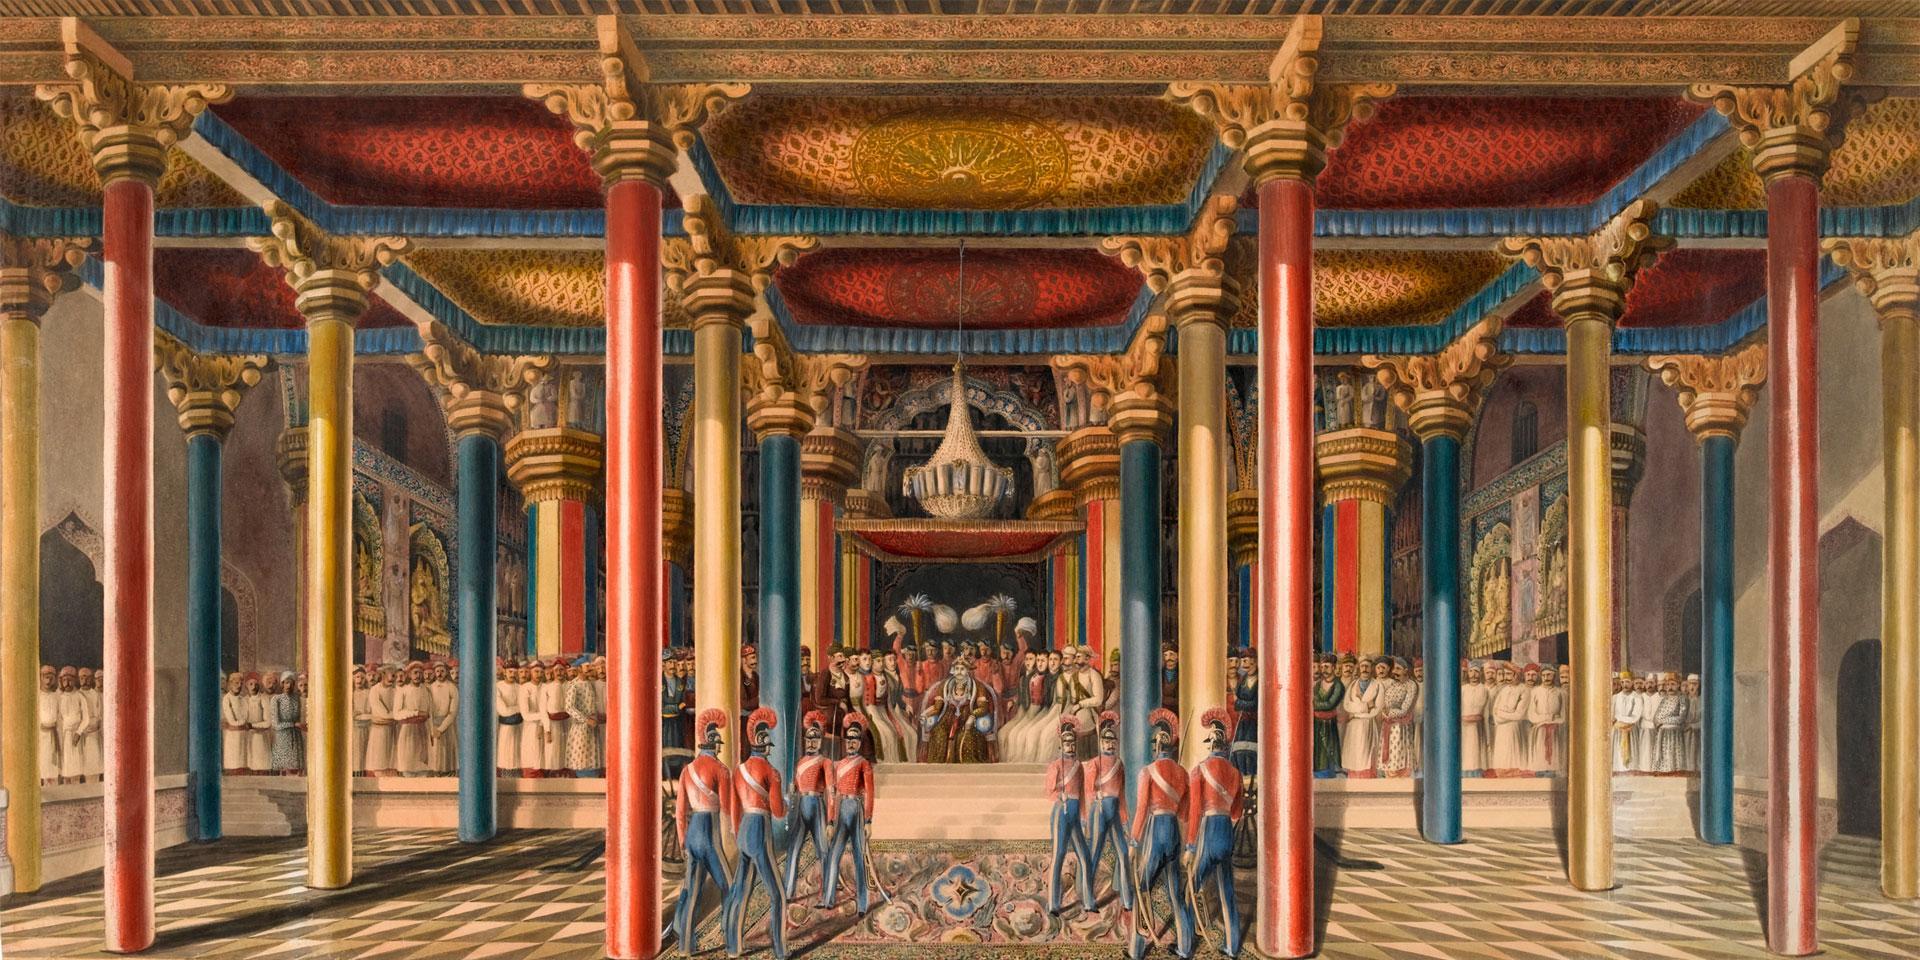 The Tanjore Durbar, Madras, February 1840